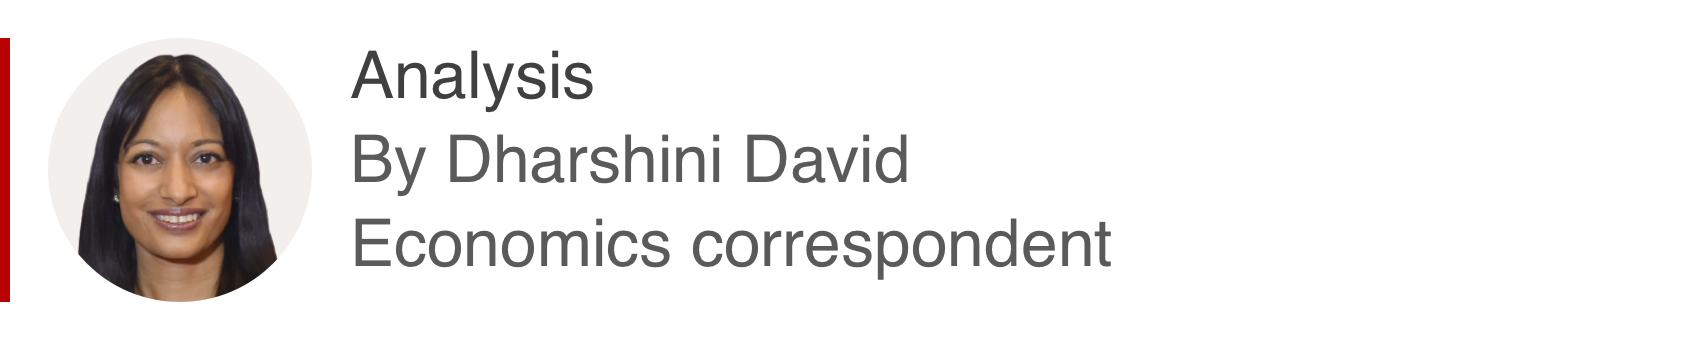 Analysis box by Dharshini David, economics correspondent